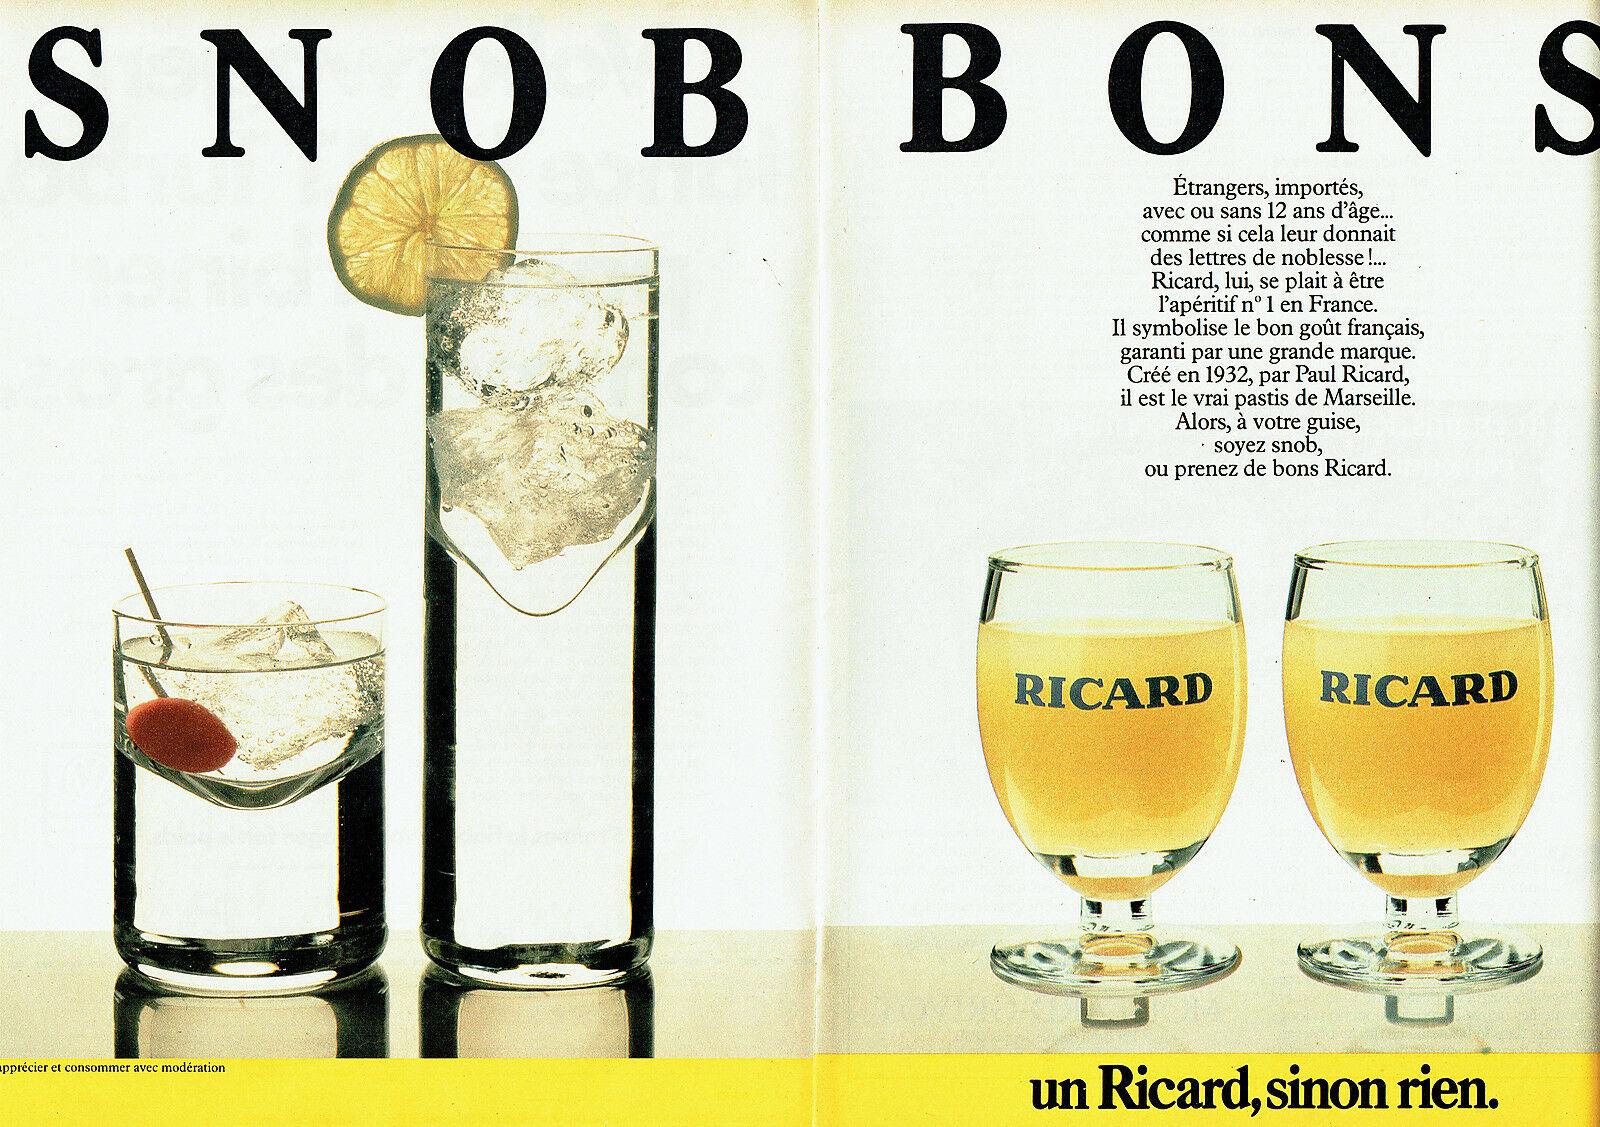 1984 Ricard Snobs bons